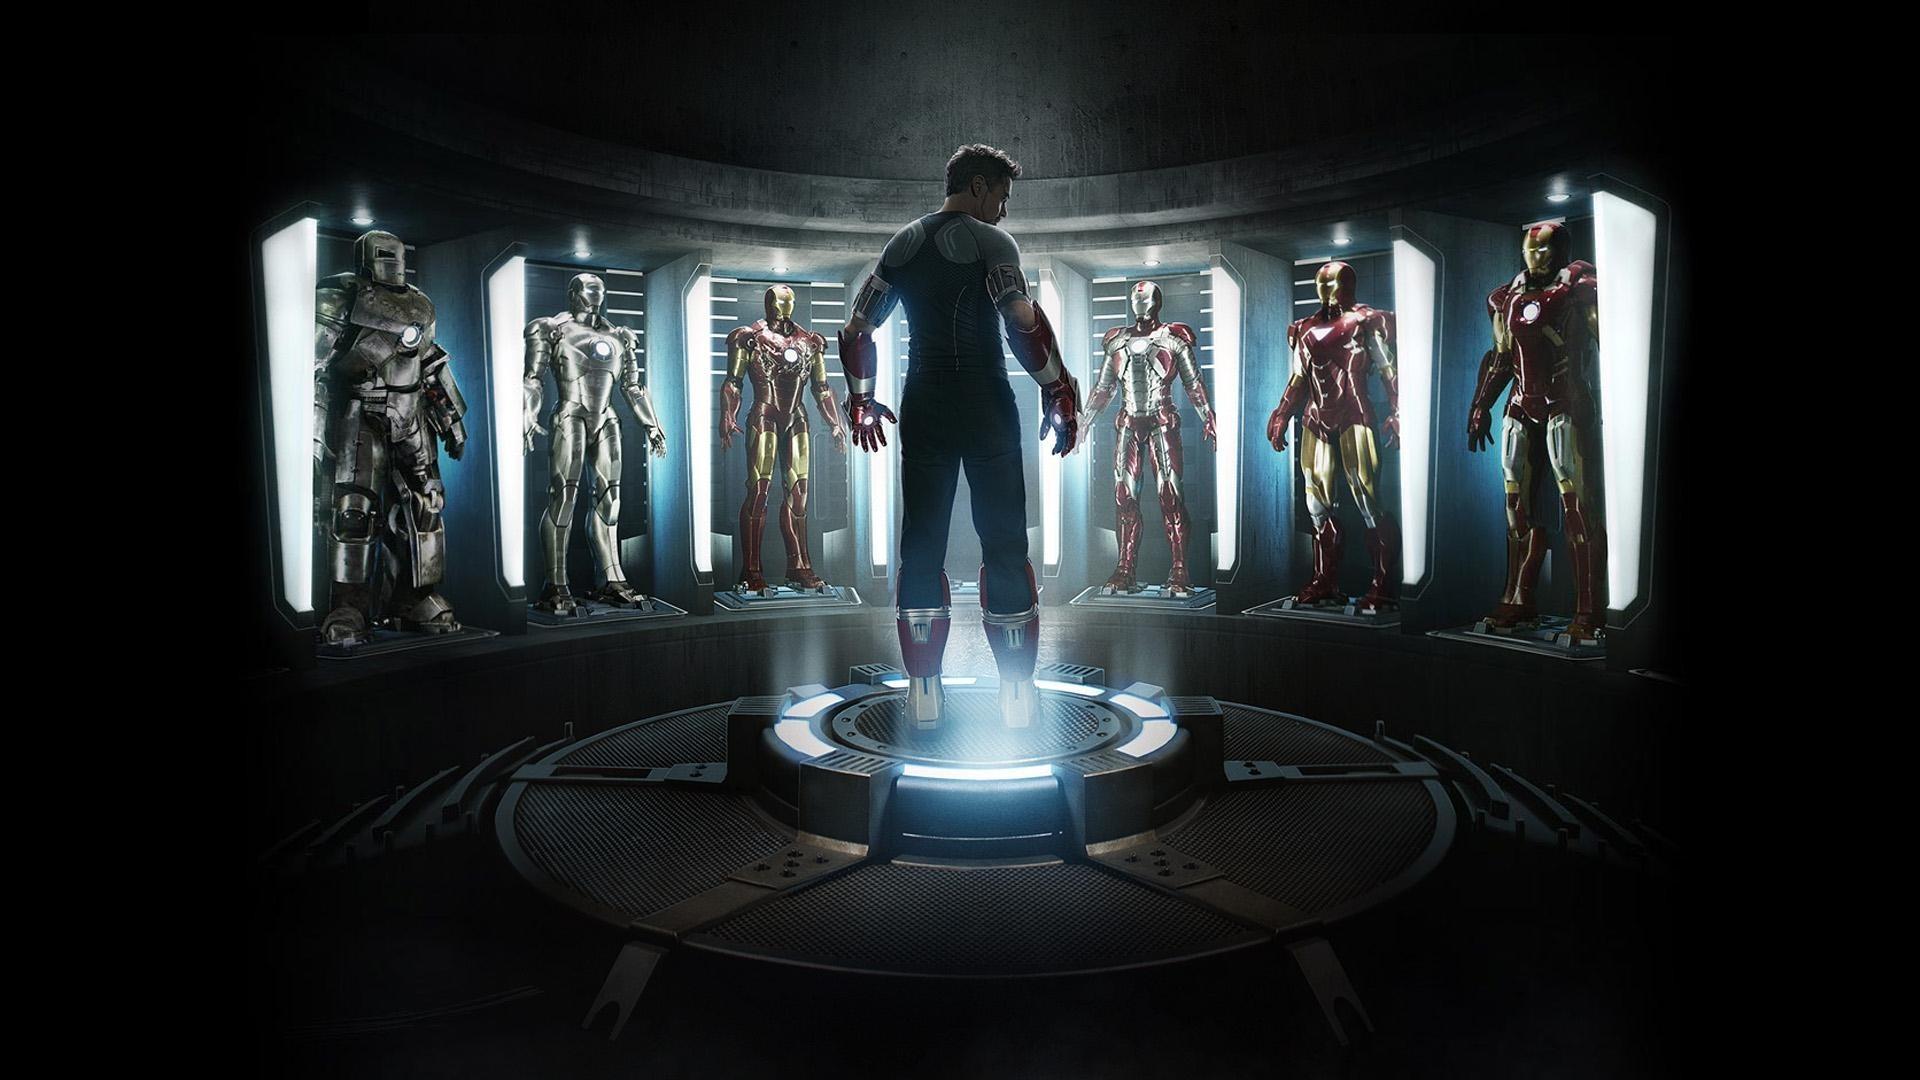 wallpaper : movies, iron man, marvel cinematic universe, iron man 3